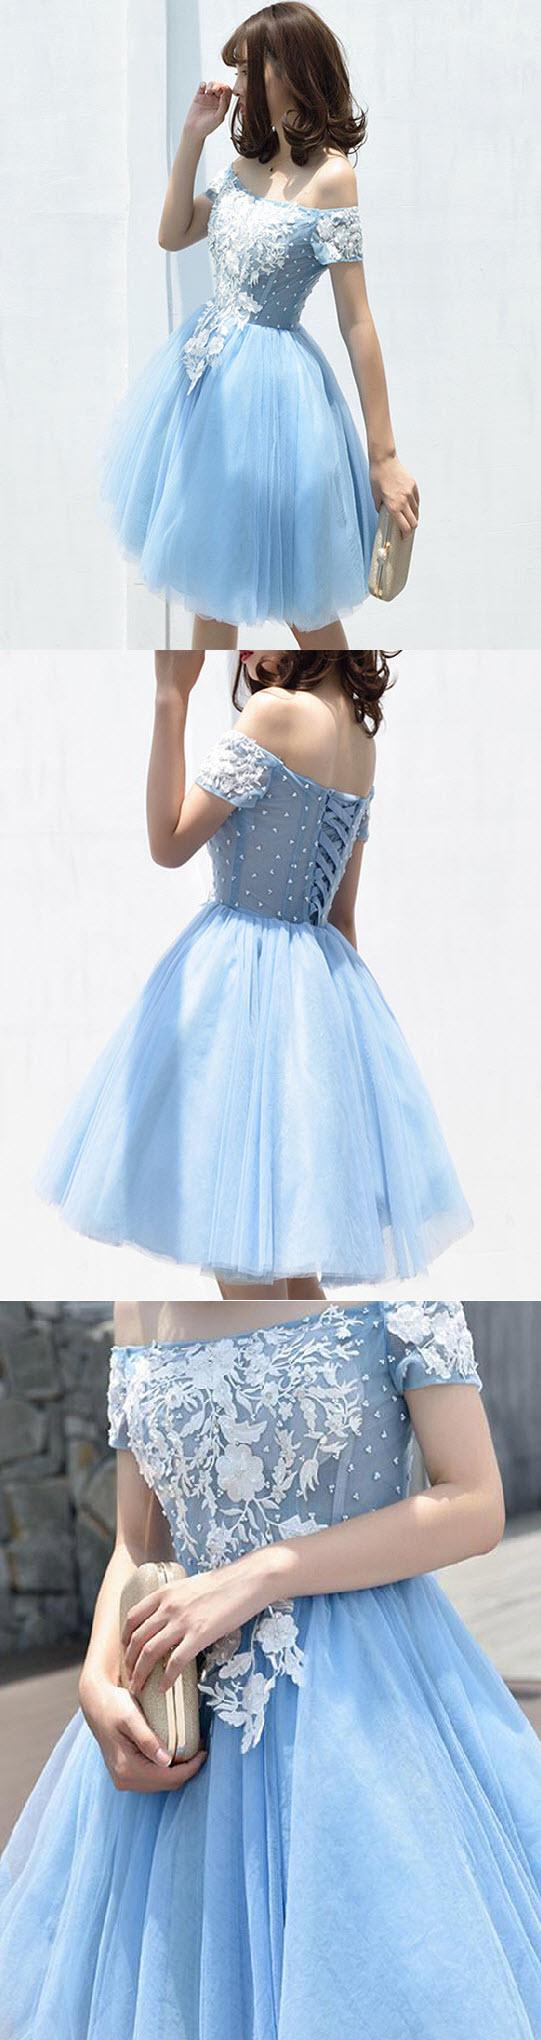 Aline offtheshoulder kneelength short tulle homecoming dress